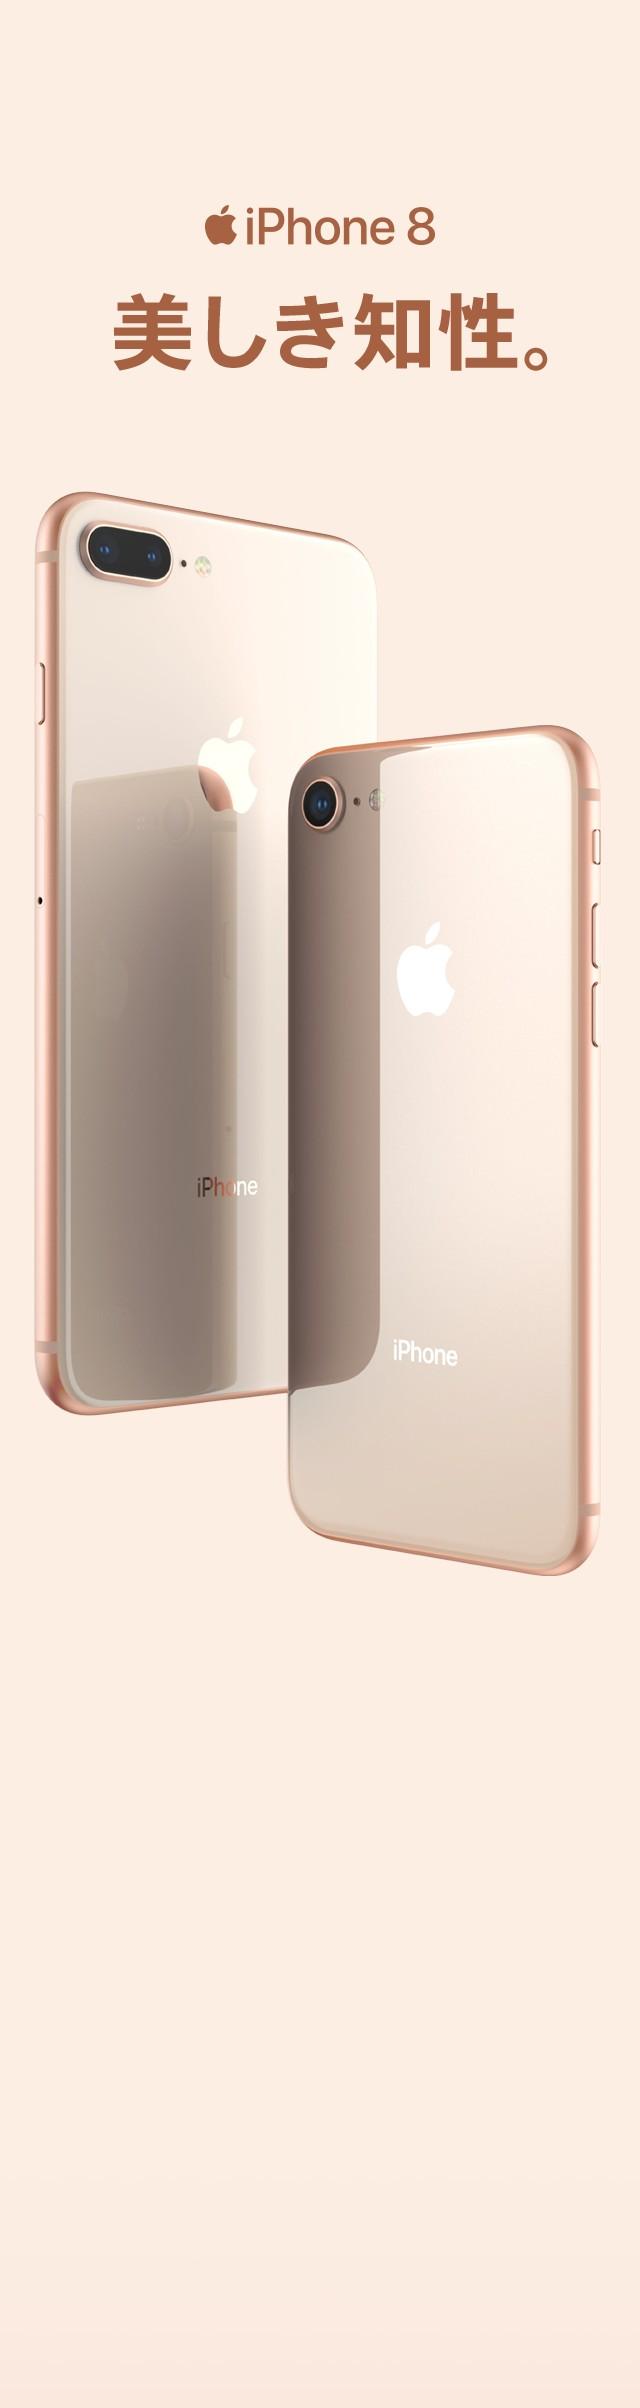 iPhone 8 美しき知性。